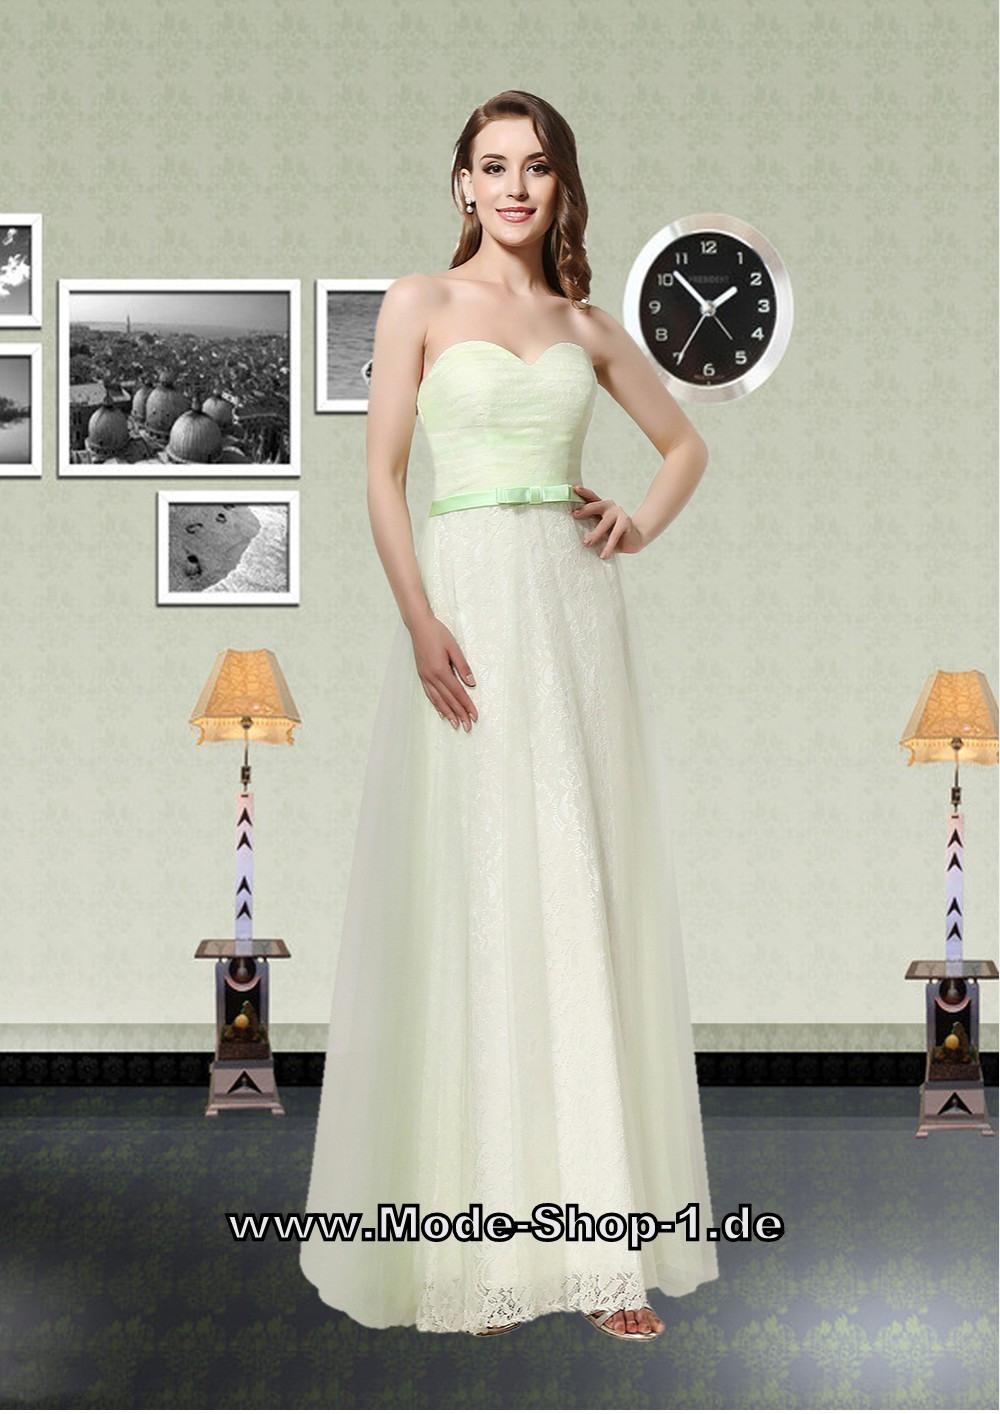 17 Wunderbar Abendkleid Umstandsmode Lang StylishAbend Schön Abendkleid Umstandsmode Lang Stylish